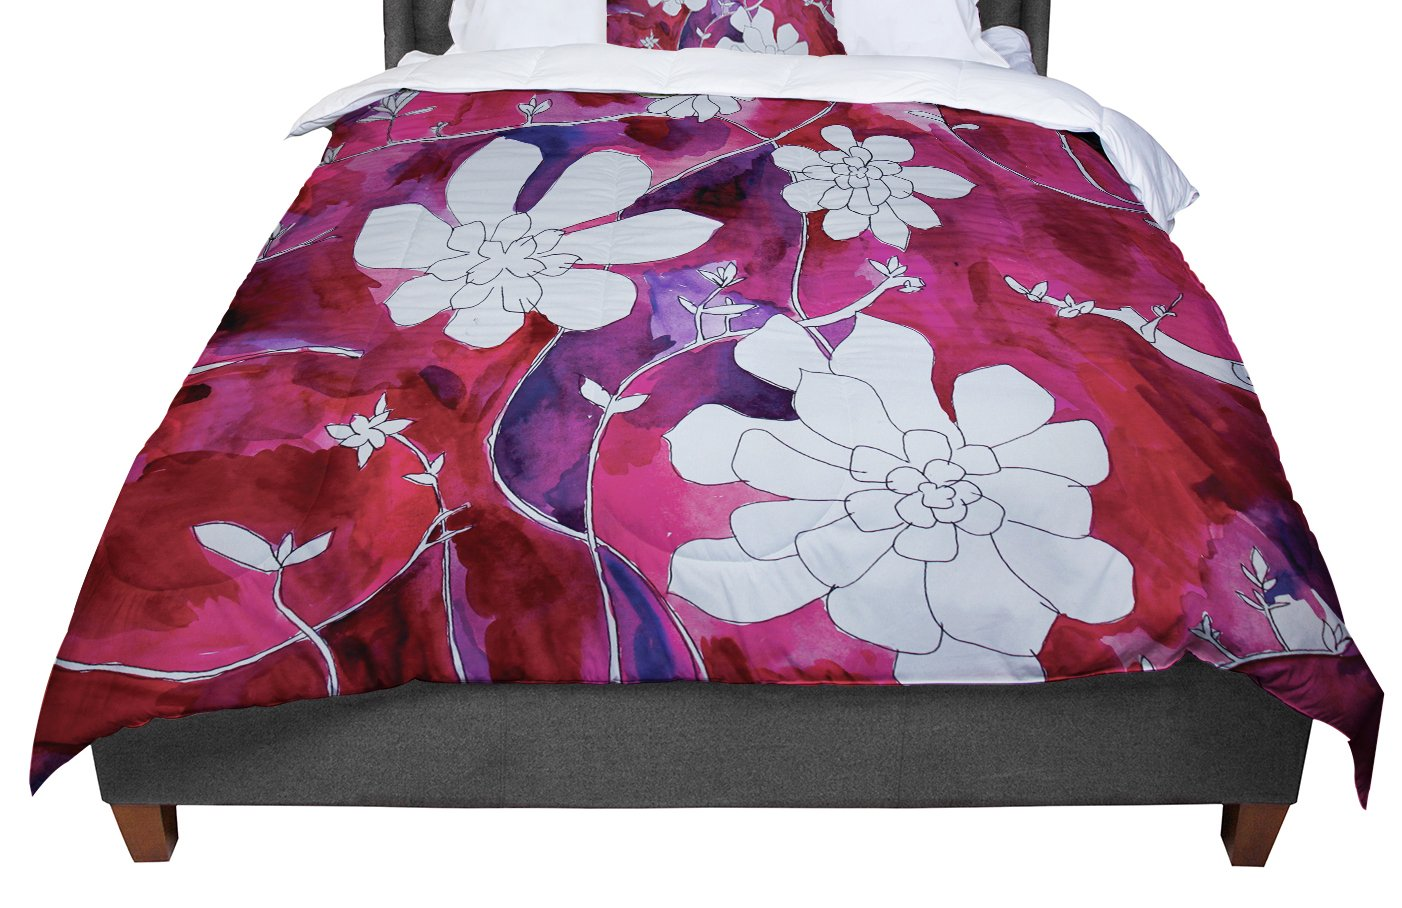 KESS InHouse Theresa Giolzetti ''Succulent Dance II'' King / Cal King Comforter, 104'' X 88''